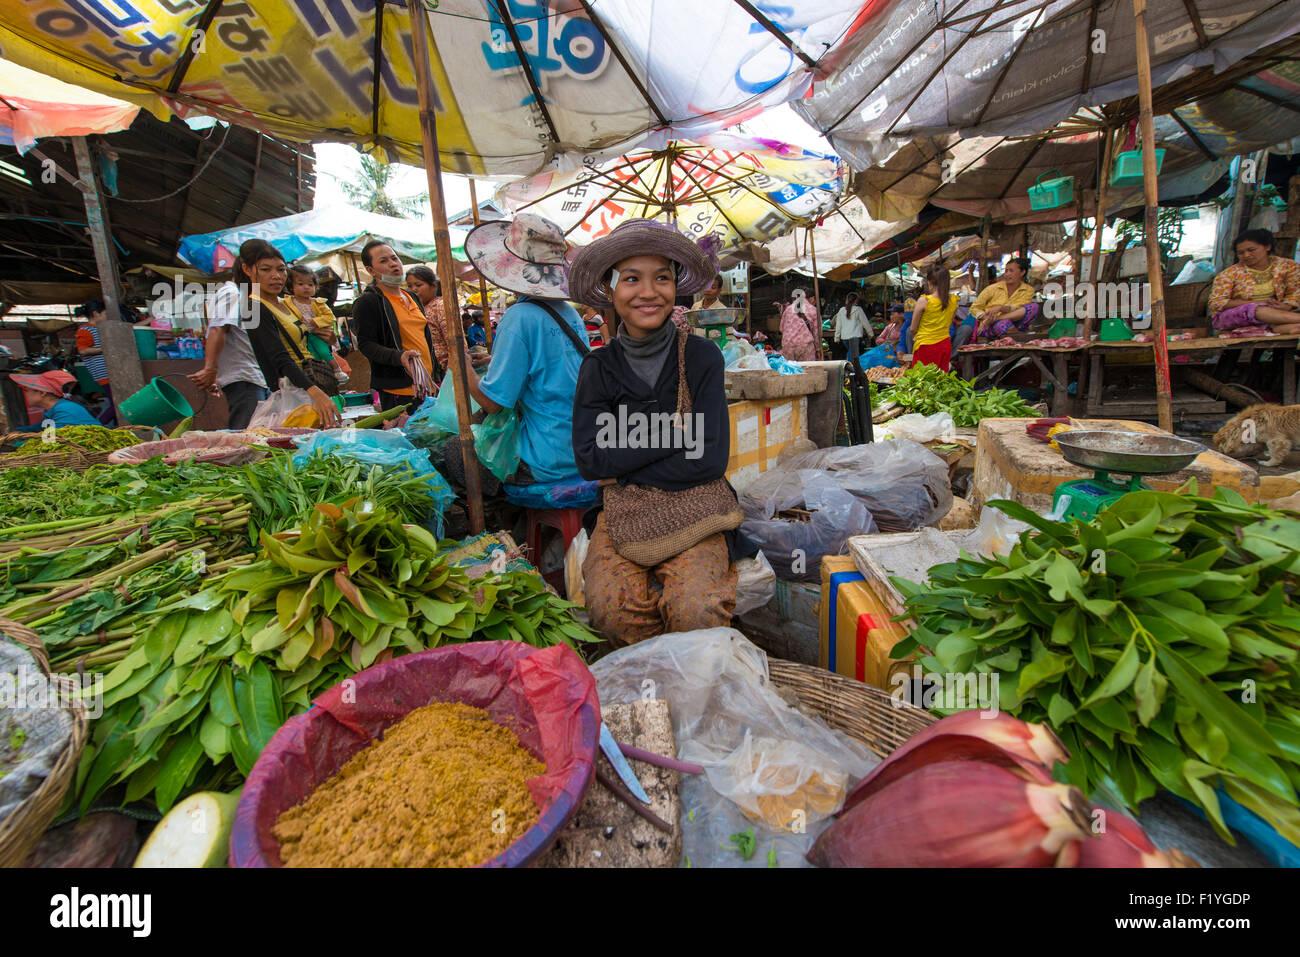 Siem Reap's Psar Leu Market. Local market. Siem Reap, Cambodia Stock Photo